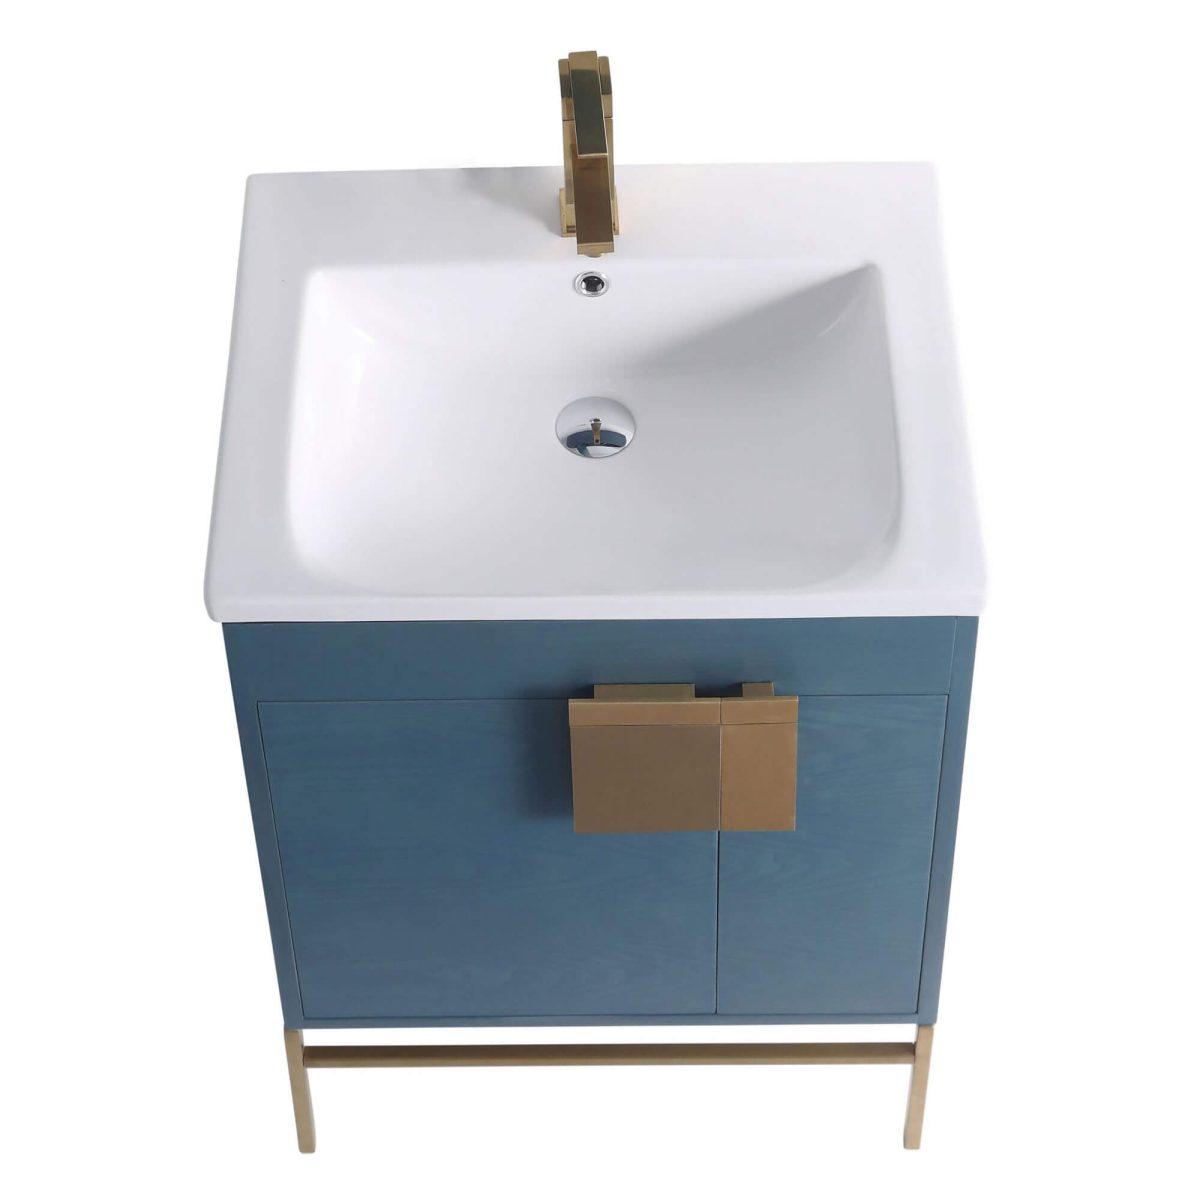 "Shawbridge 24"" Modern Bathroom Vanity  French Blue with Satin Brass Hardware"